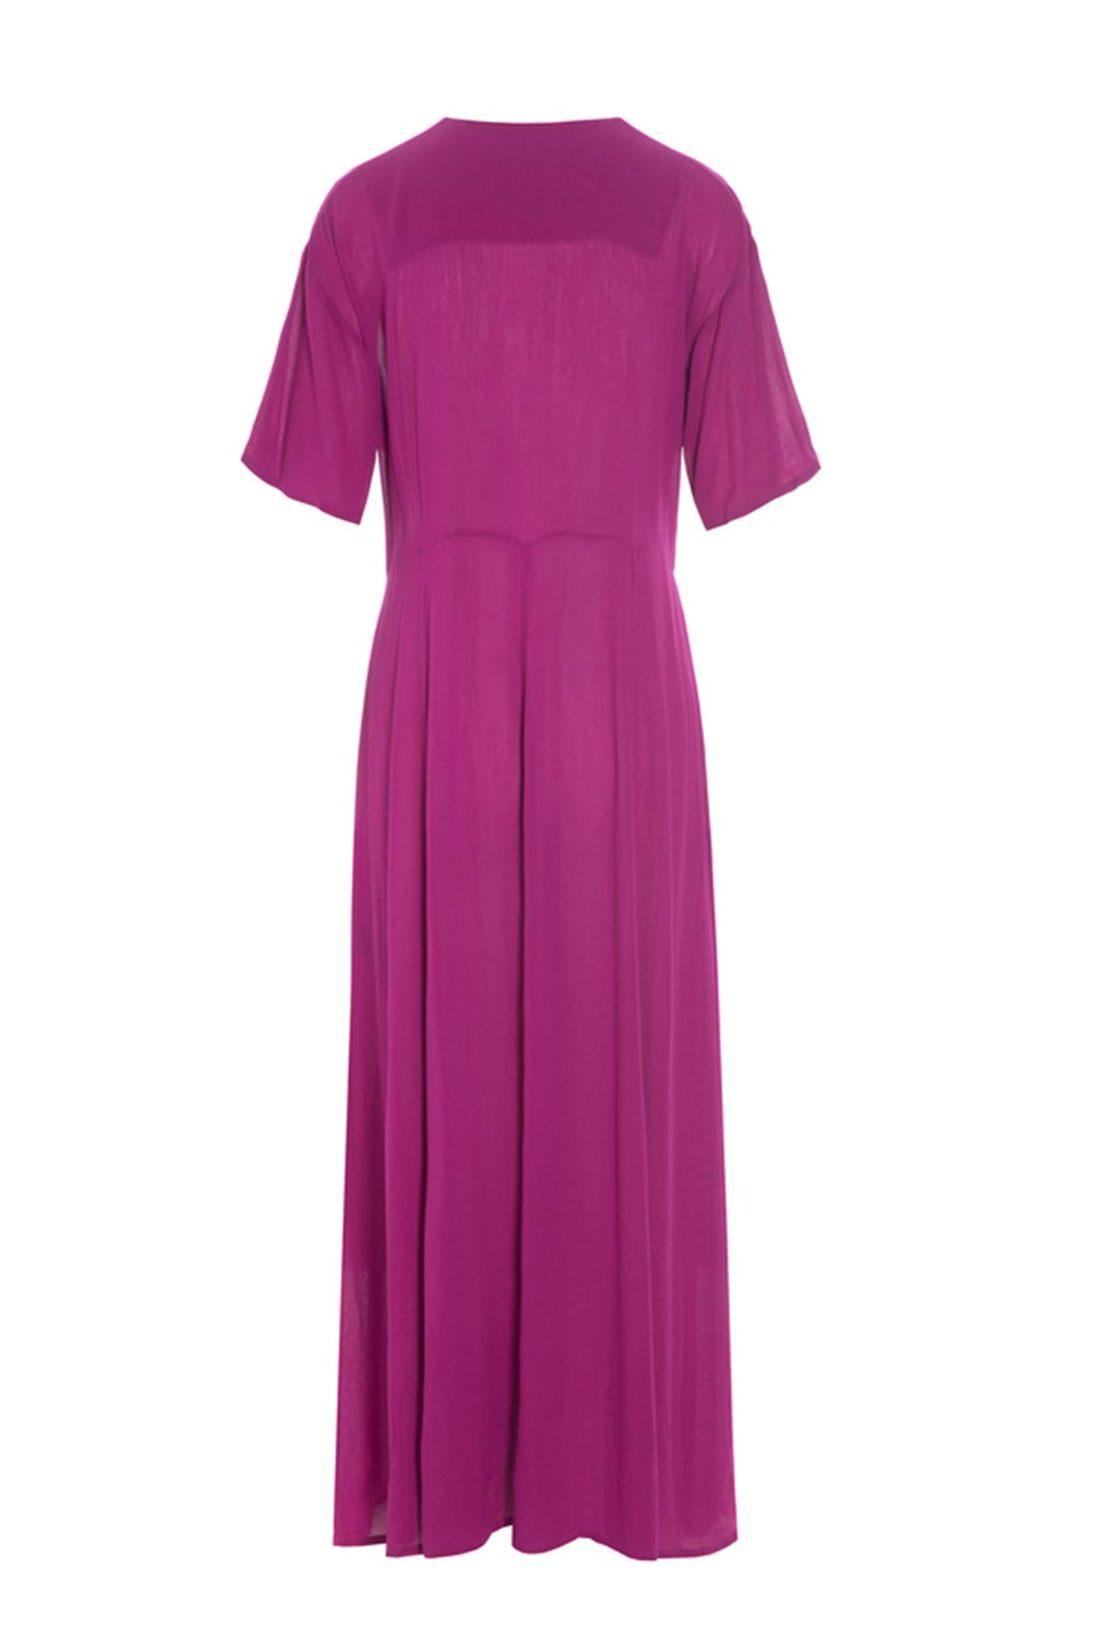 BITTE KAI RAND – Lang kjole med luftige ærmer